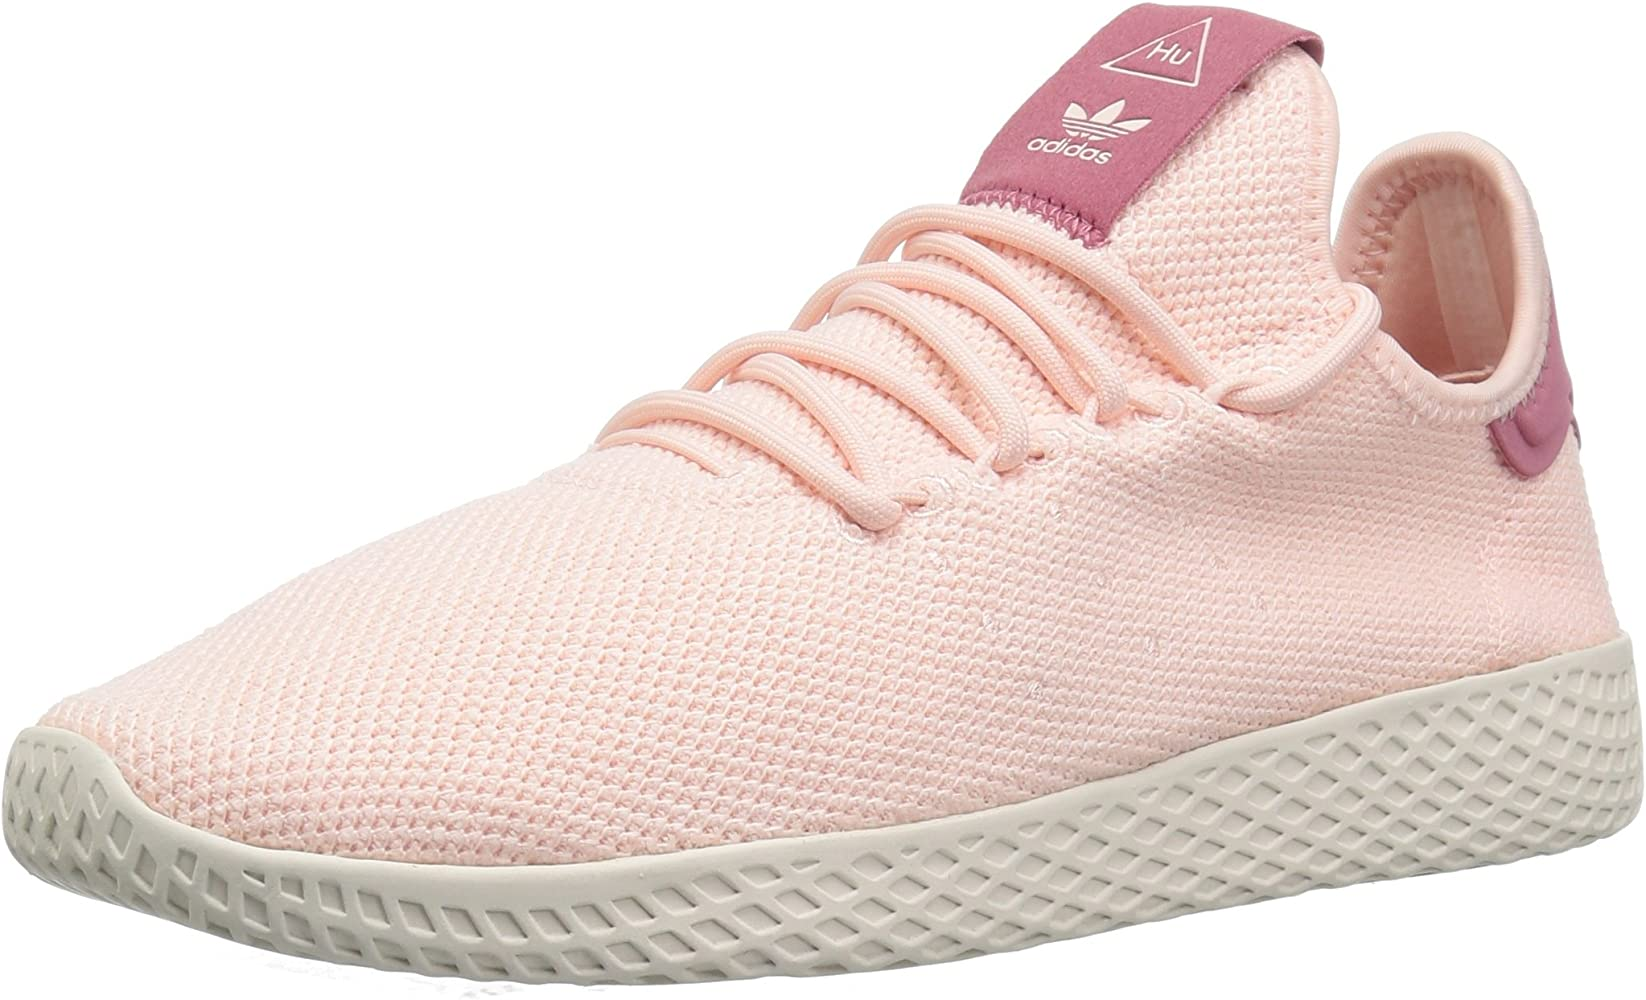 Escritor almuerzo Descriptivo  Amazon.com | adidas Originals Women's PW Tennis HU Running Shoe, ice  Pink/ice Pink/Chalk White, 9.5 M US | Tennis & Racquet Sports